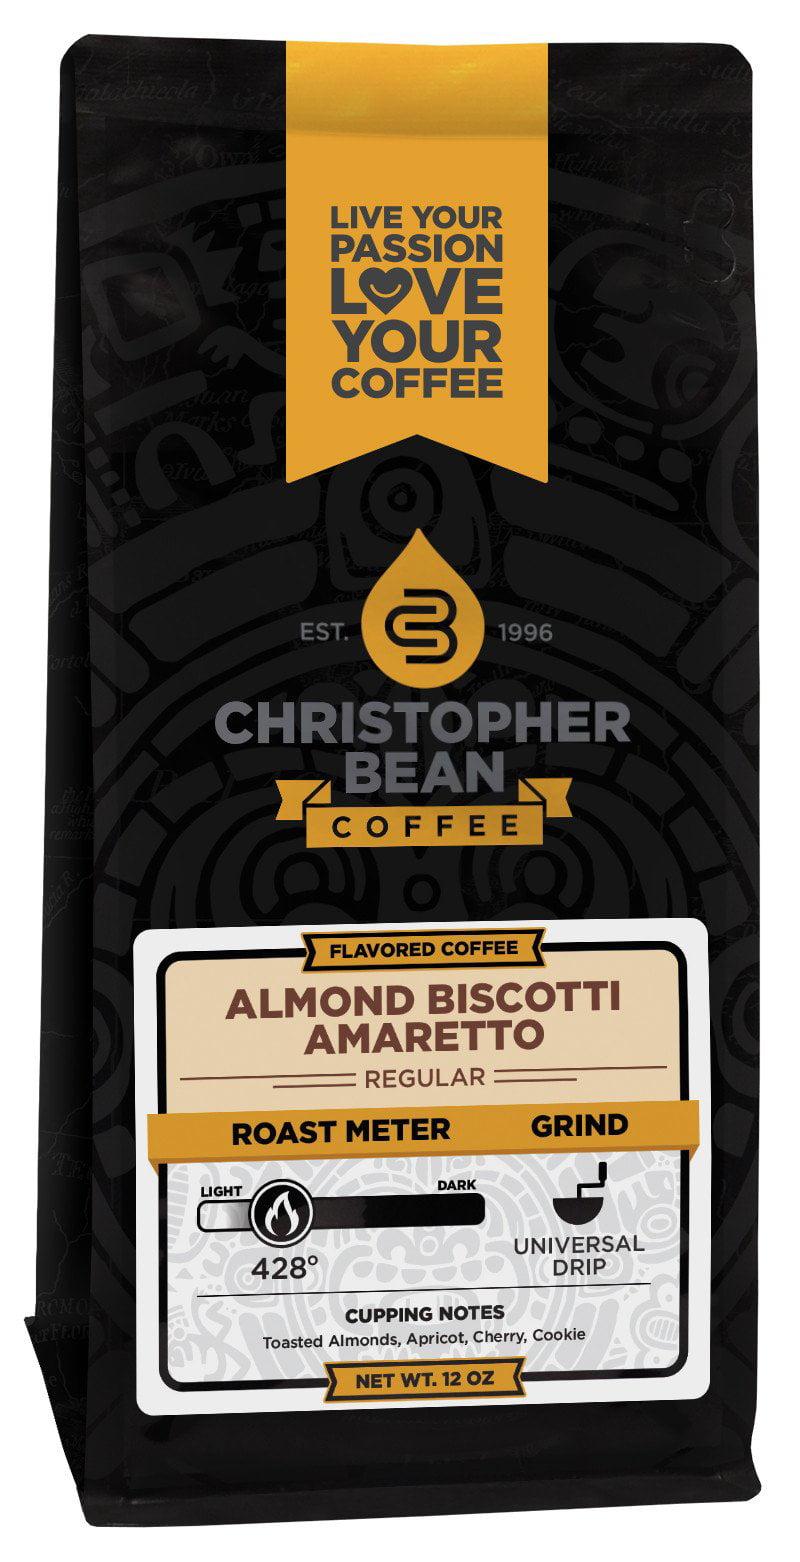 Amaretto Almond Biscotti Flavored Ground Coffee, 12 Ounce Bag